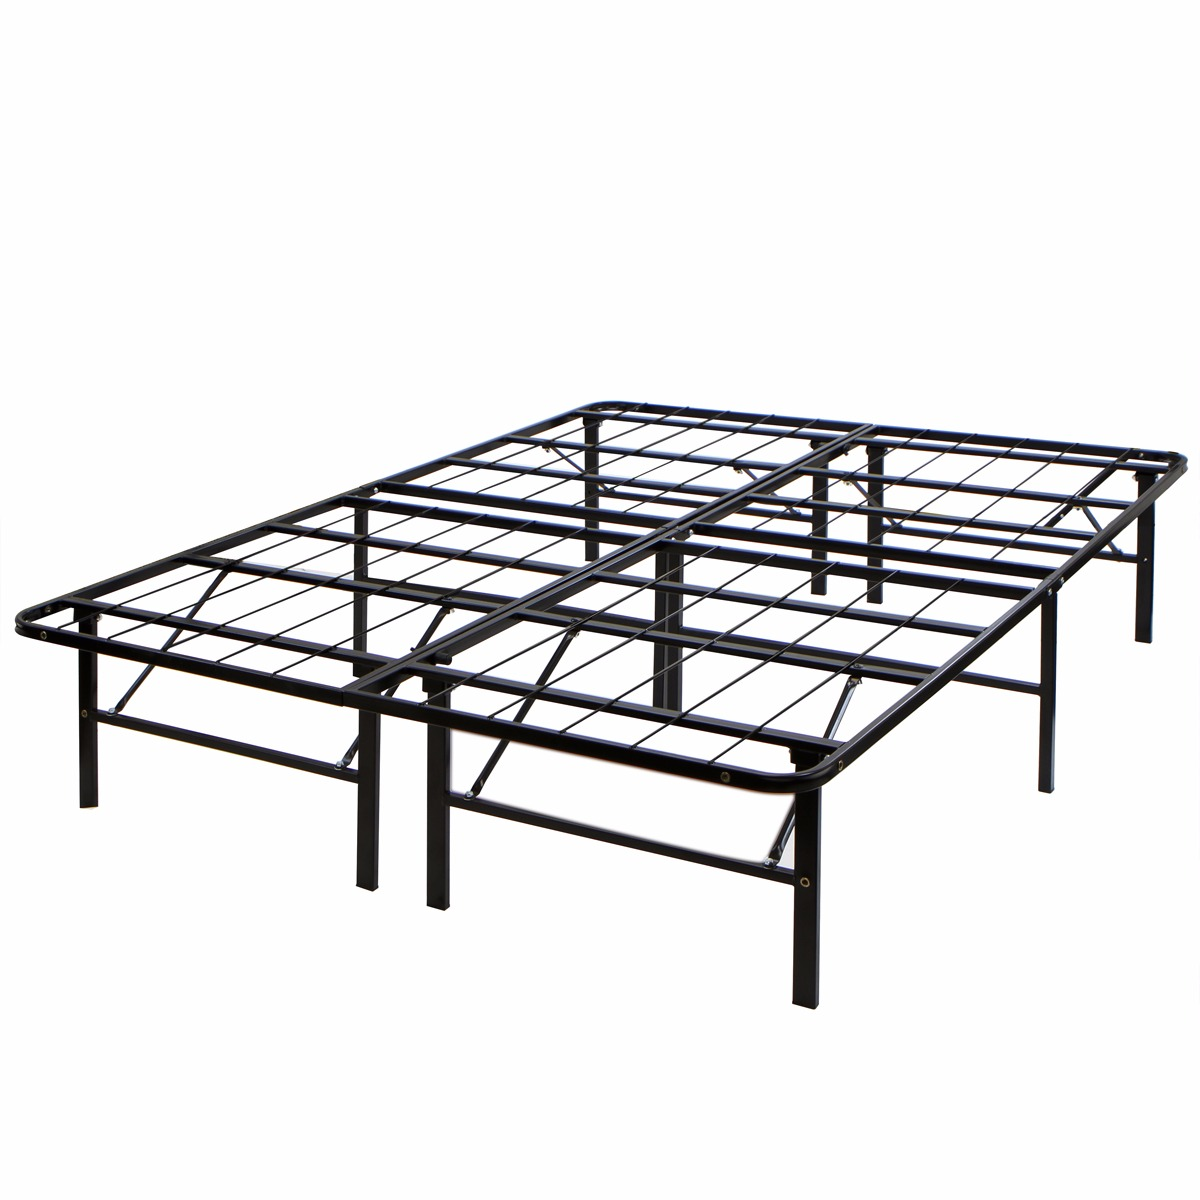 Modern Metal Bed Frames xtremepowerus modern metal folding bed frame platform, full size